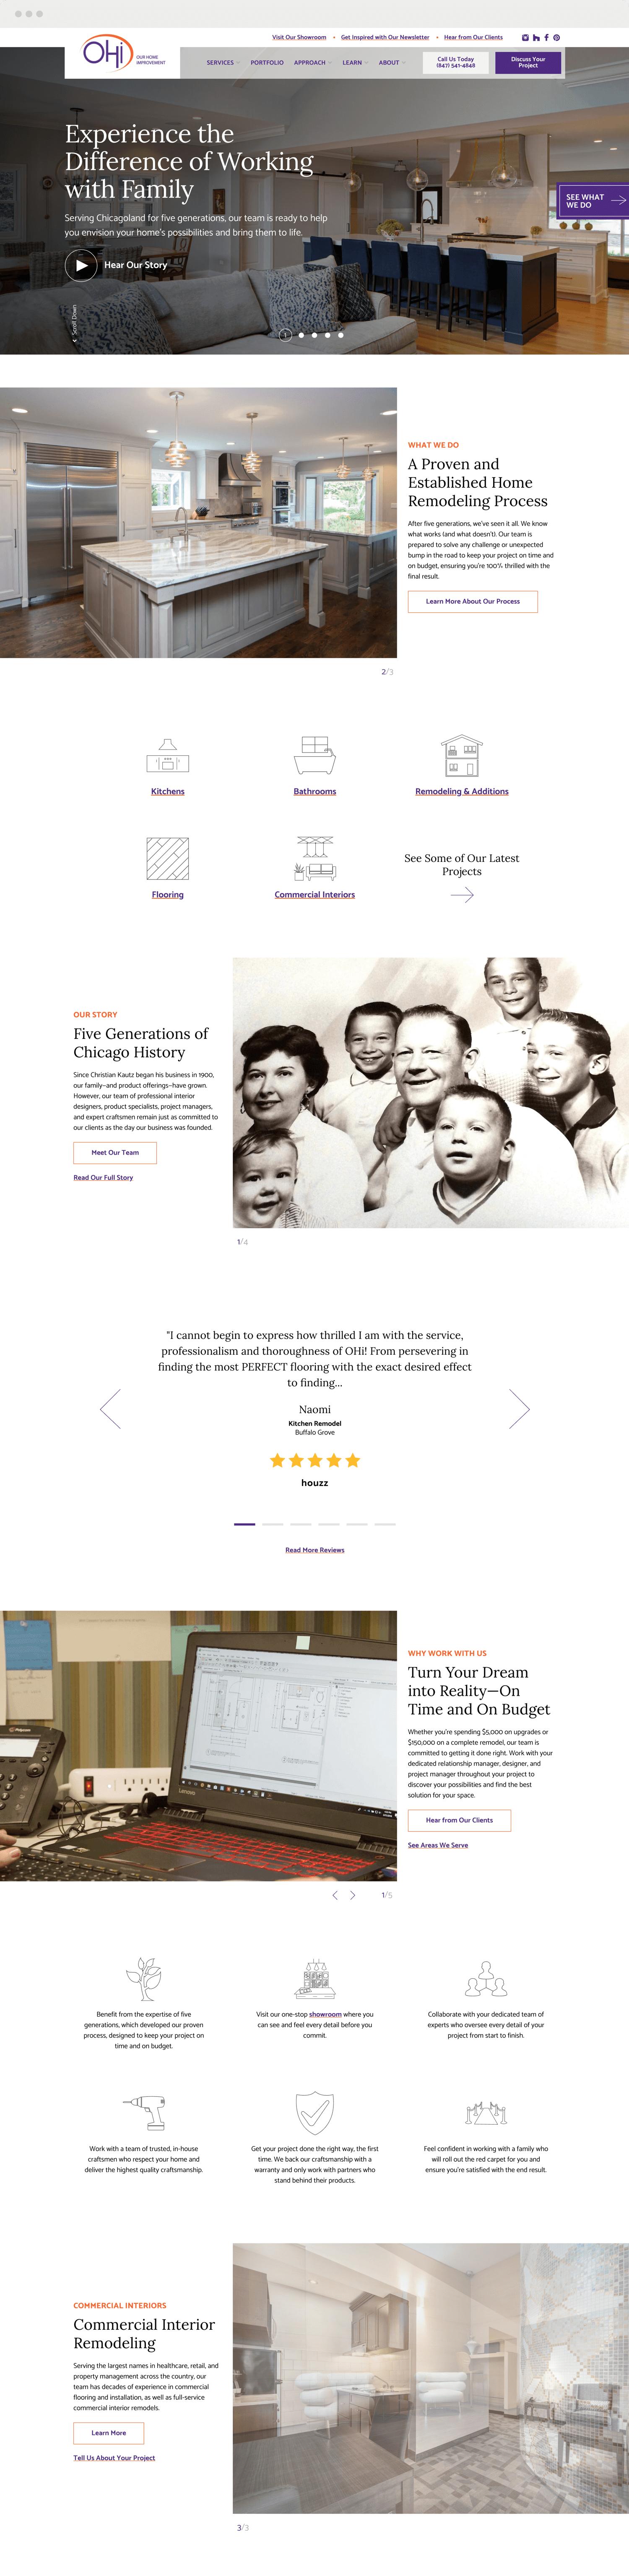 WebDesign_ohi-homepage-1